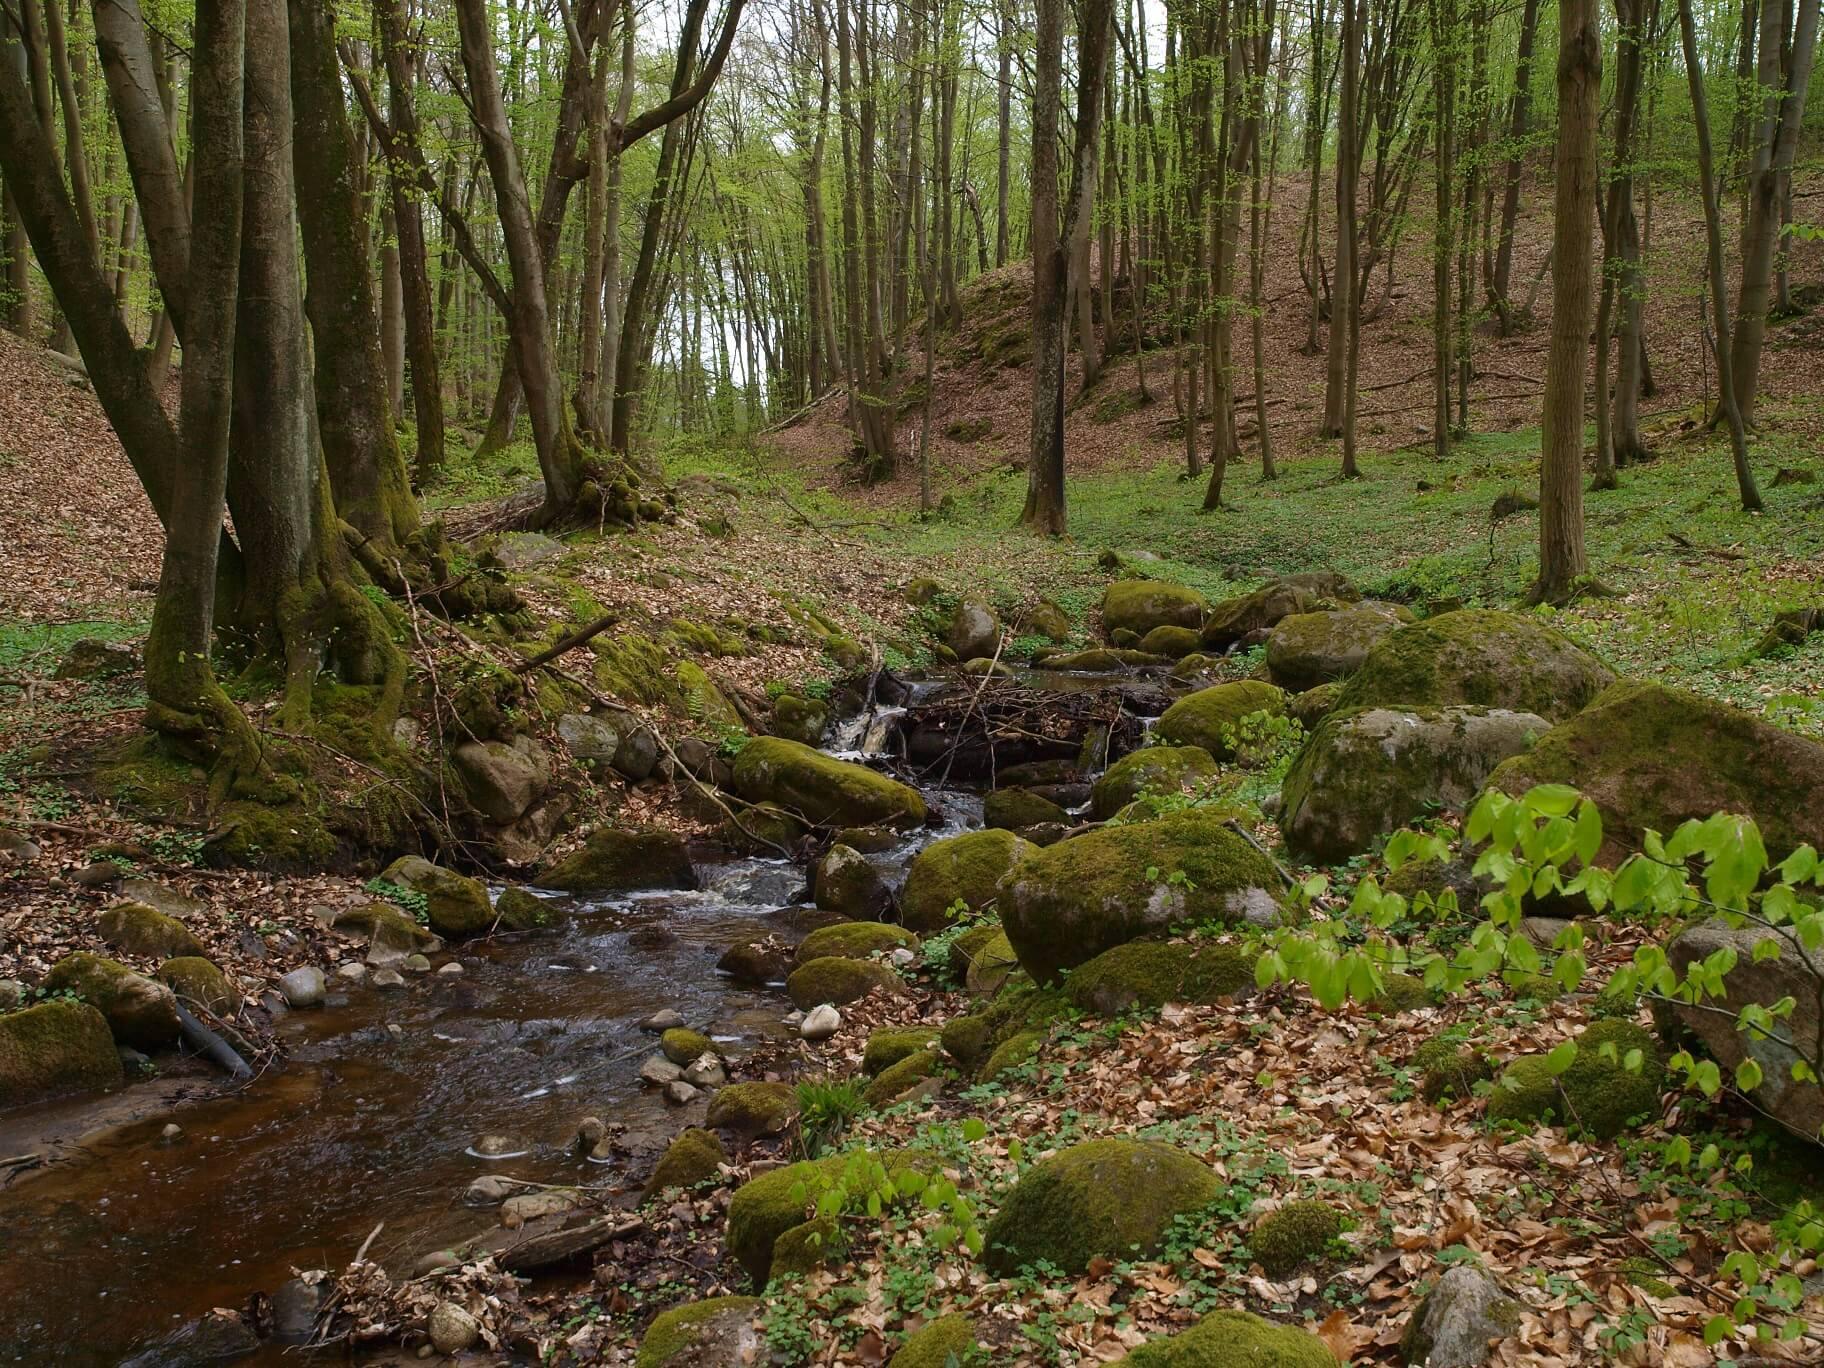 Dolina Slupi PK6 nature trail - Nature trails in Pomorskie: take a stroll and learn something new